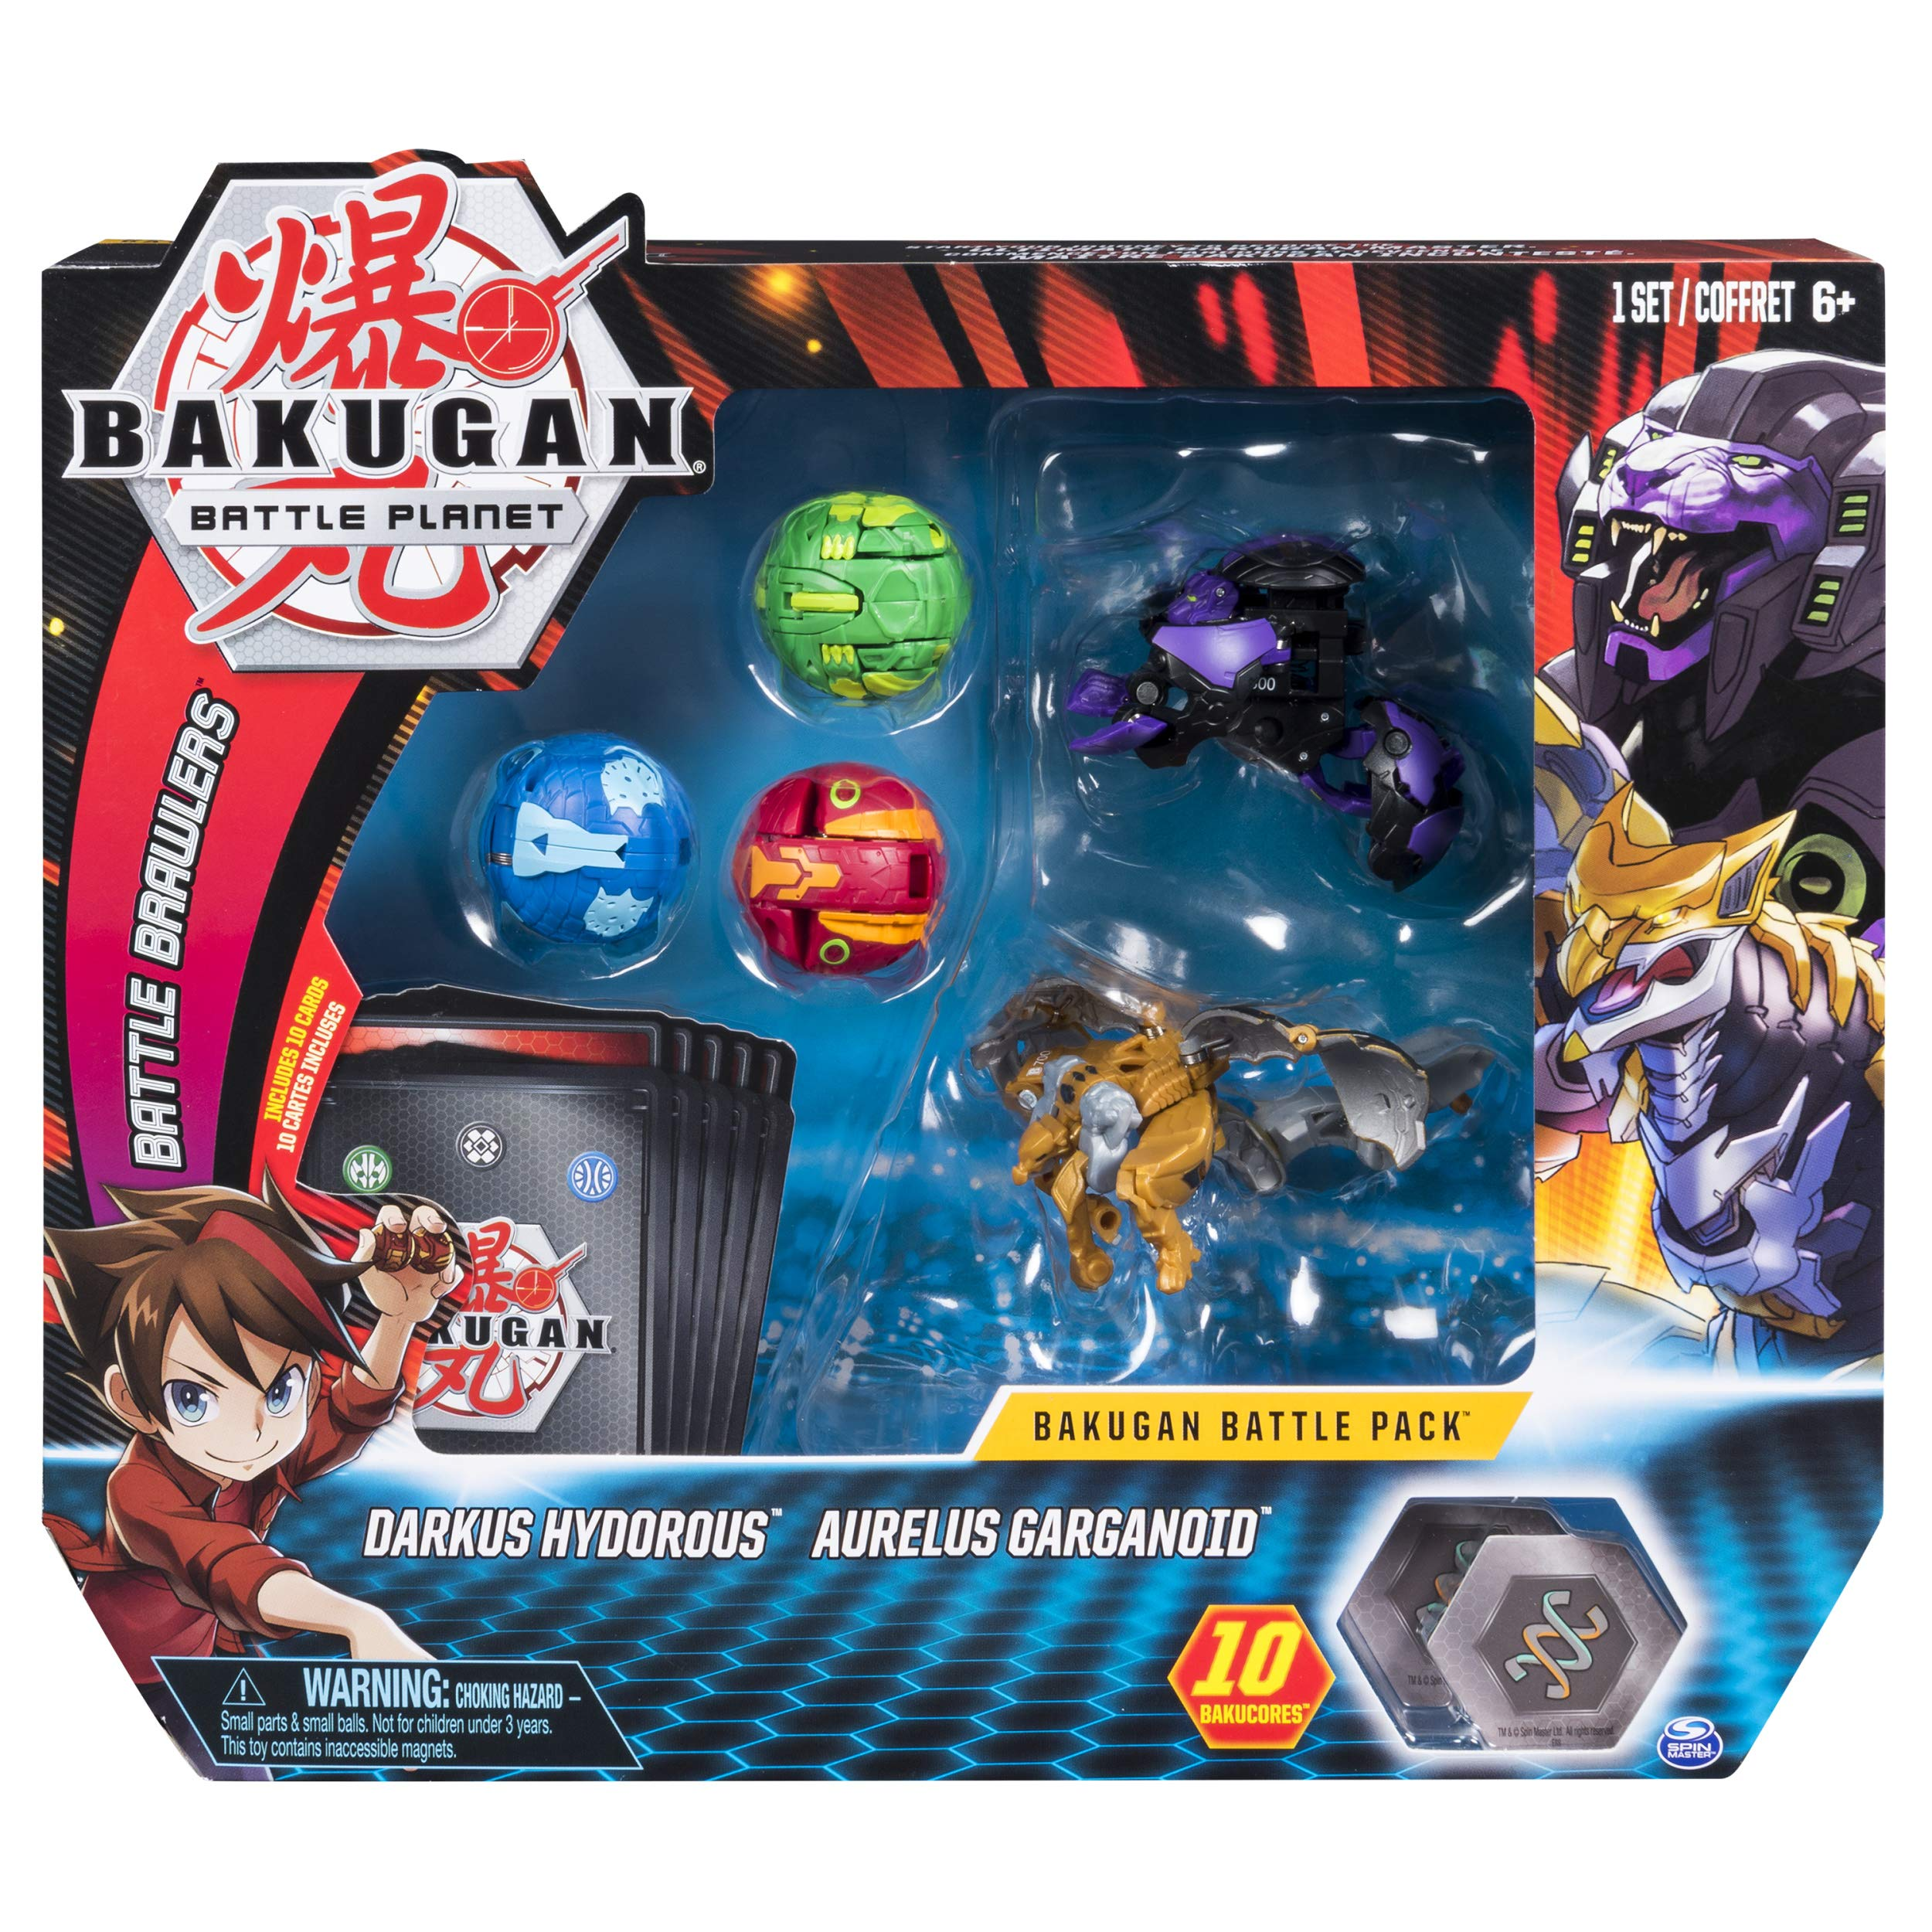 Bakugan Battle 5-Pack Darkus Hydorous & Aurelus Gargarnoid Collectible Cards & Figures by Bakugan